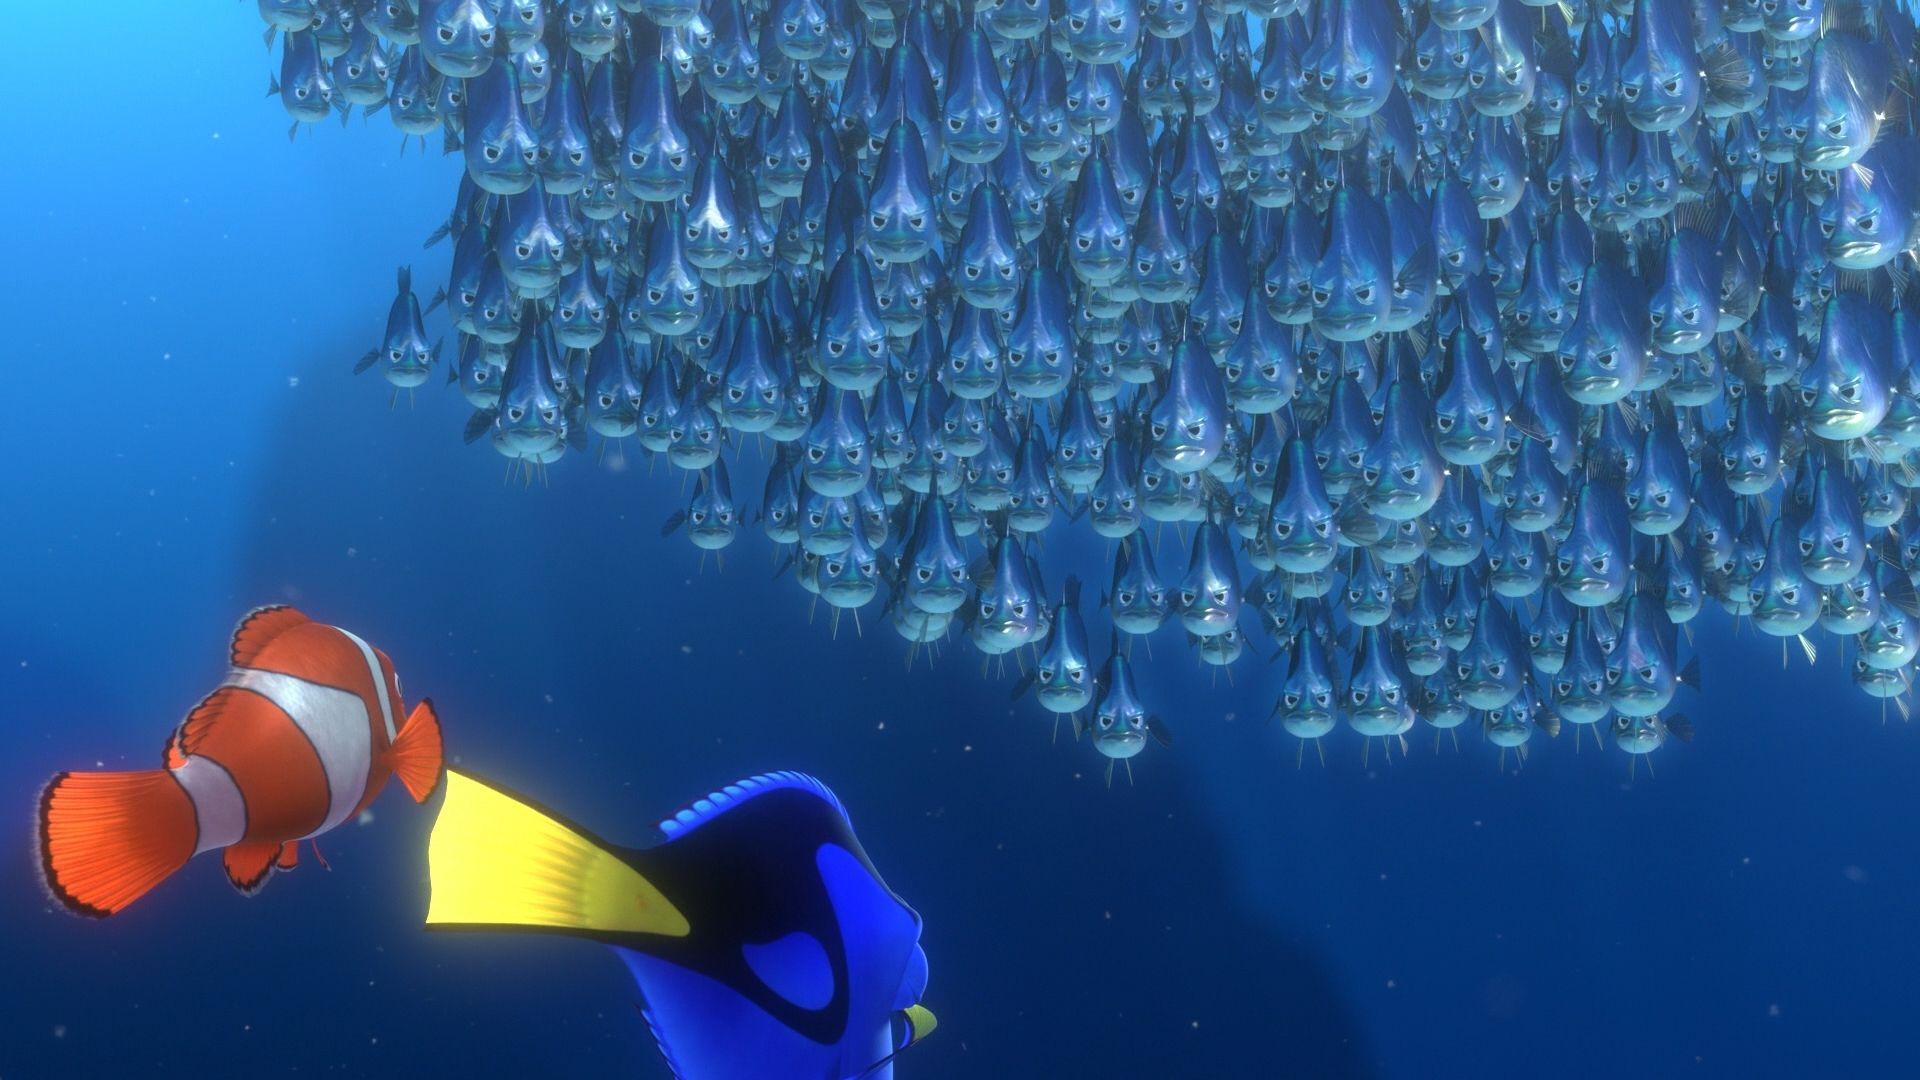 Finding nemo fish school john ratzenberger pixar voice for Finding nemo fish